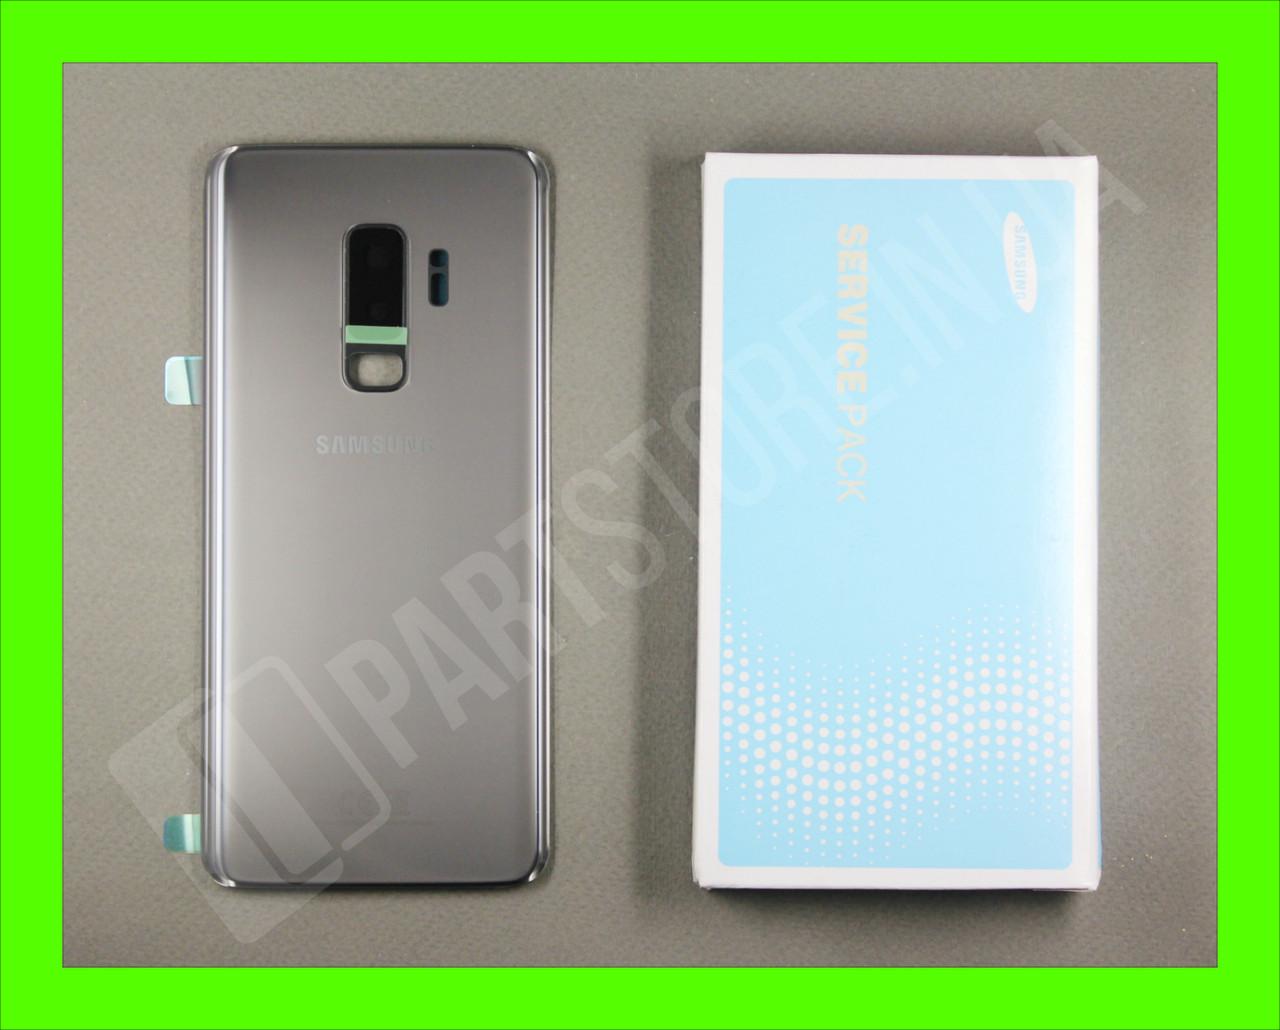 Cервисная оригинальная задняя Крышка Samsung G965 Grey S9 Plus (GH82-15724C)